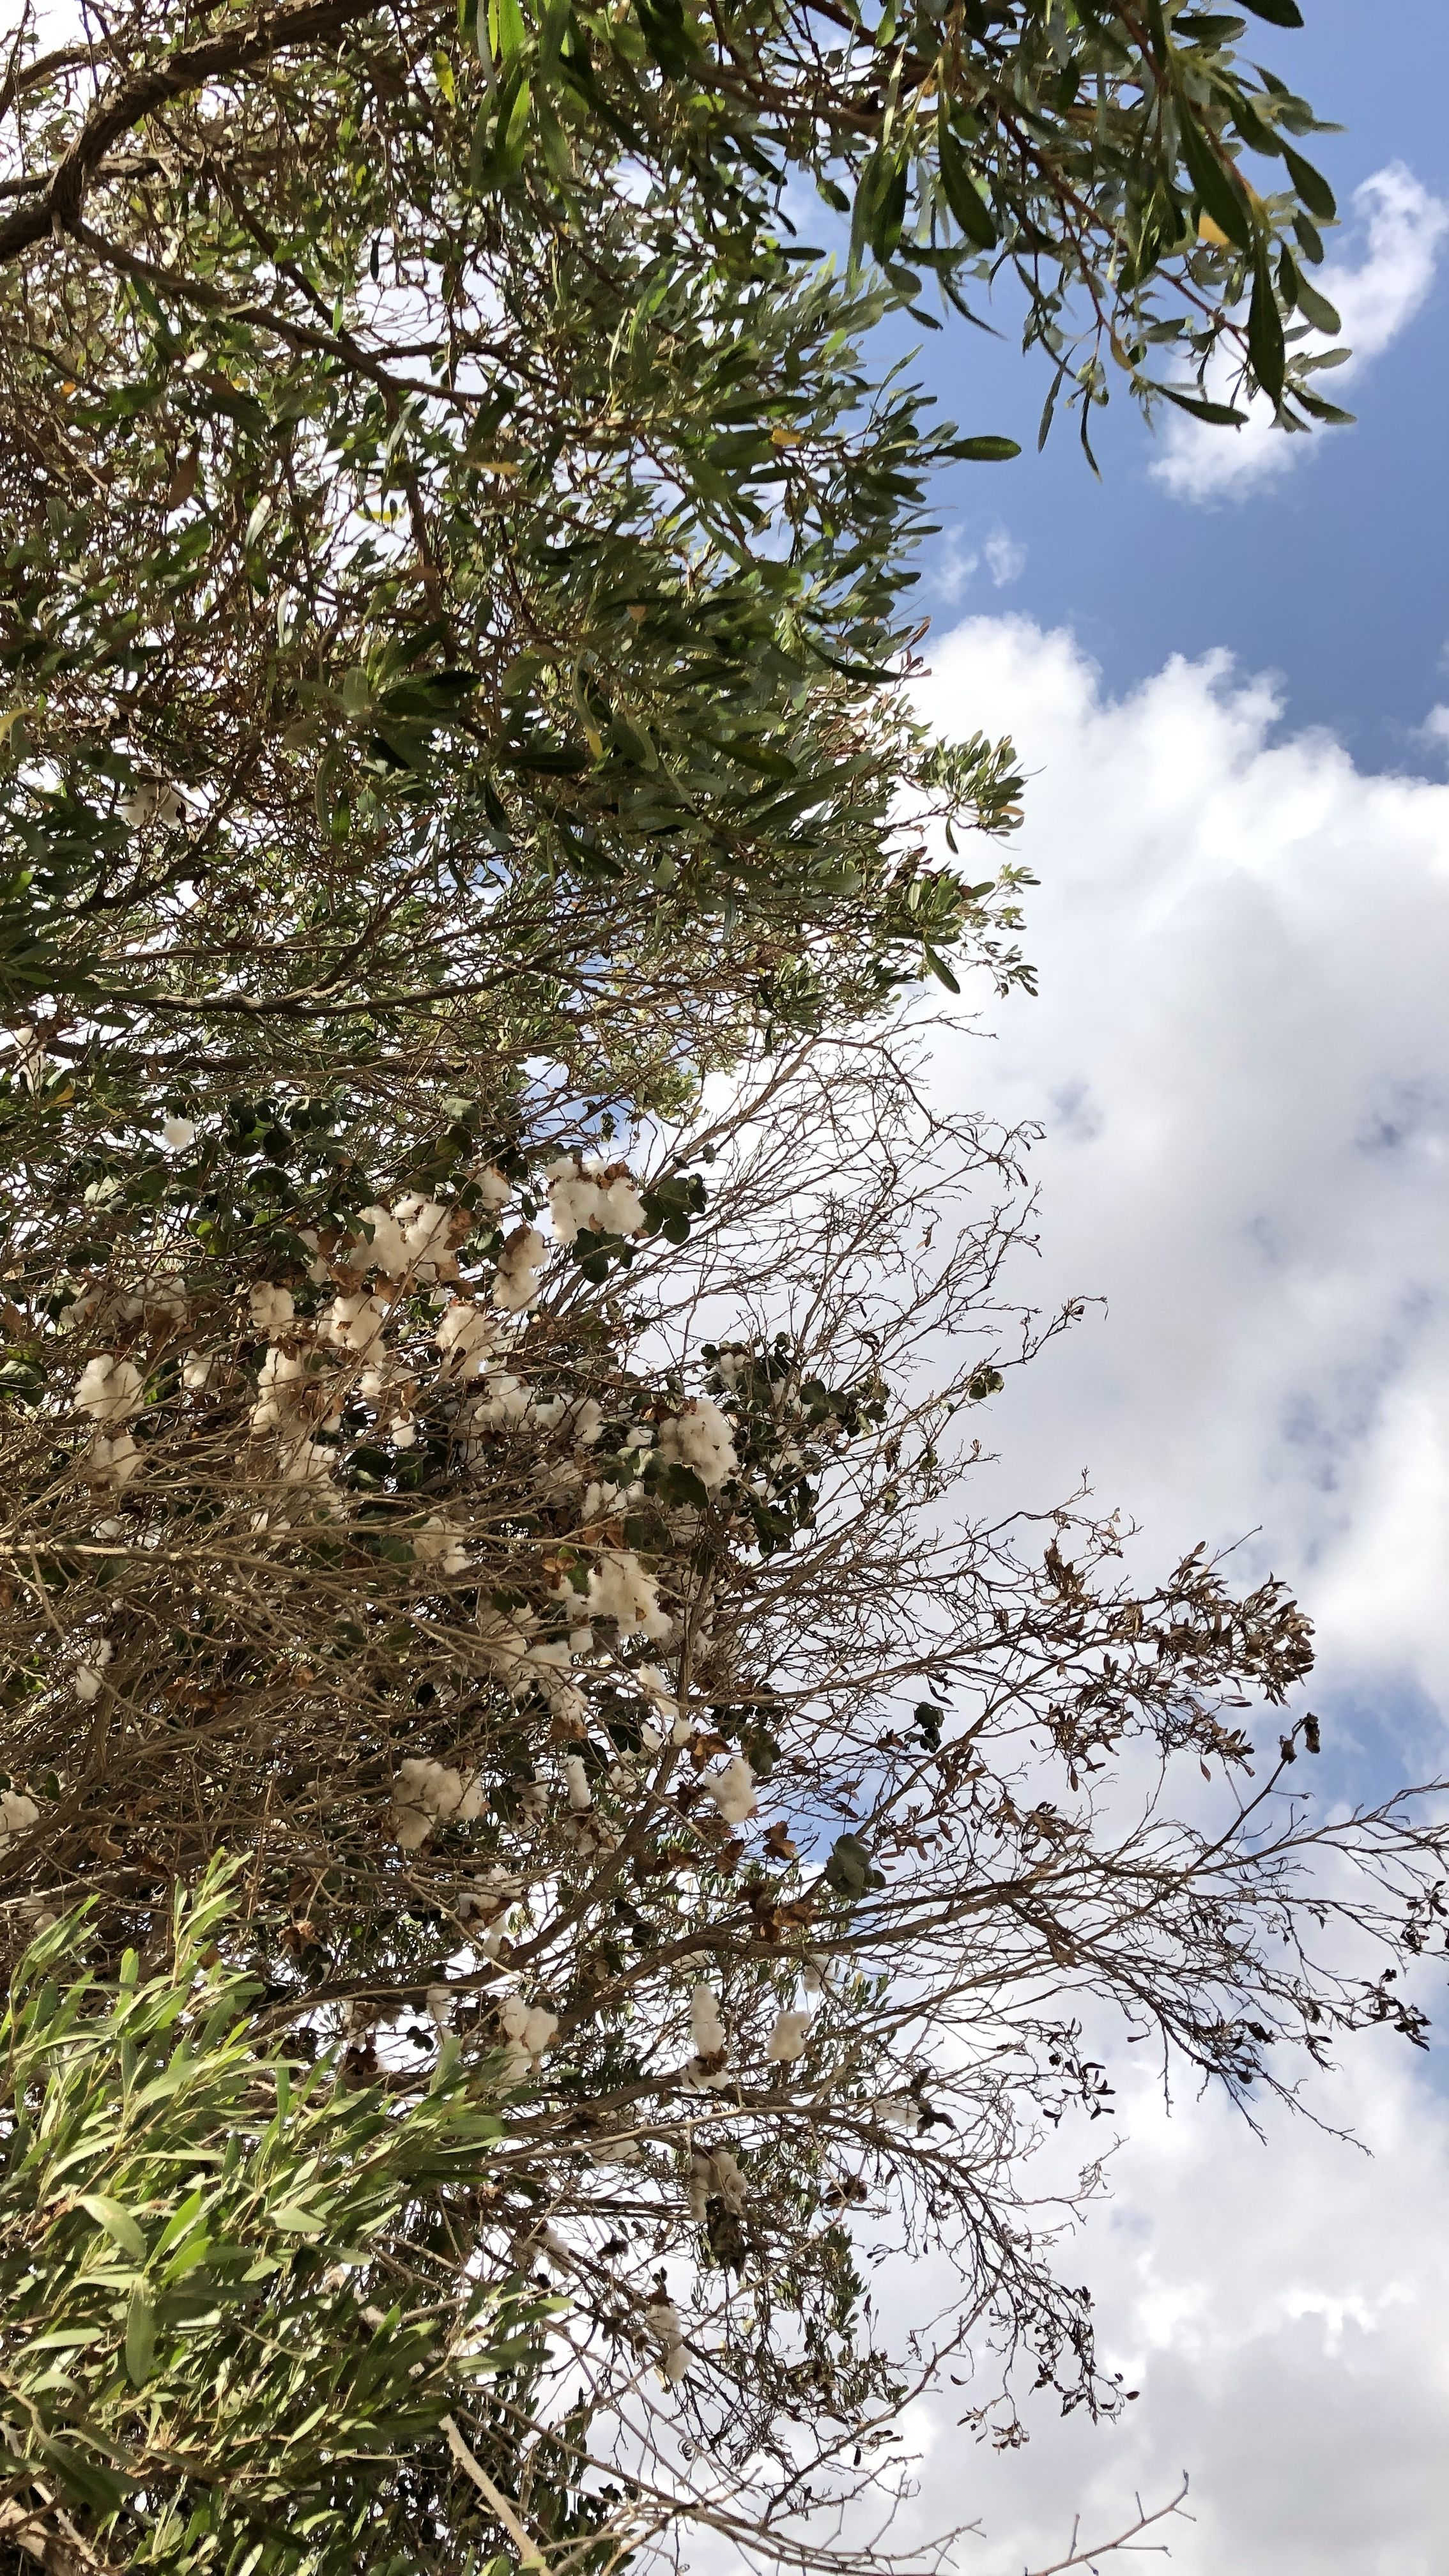 شجر Tree خلفيات ايفون افكار ابداع قطن Outdoor Phone Wallpaper Clouds